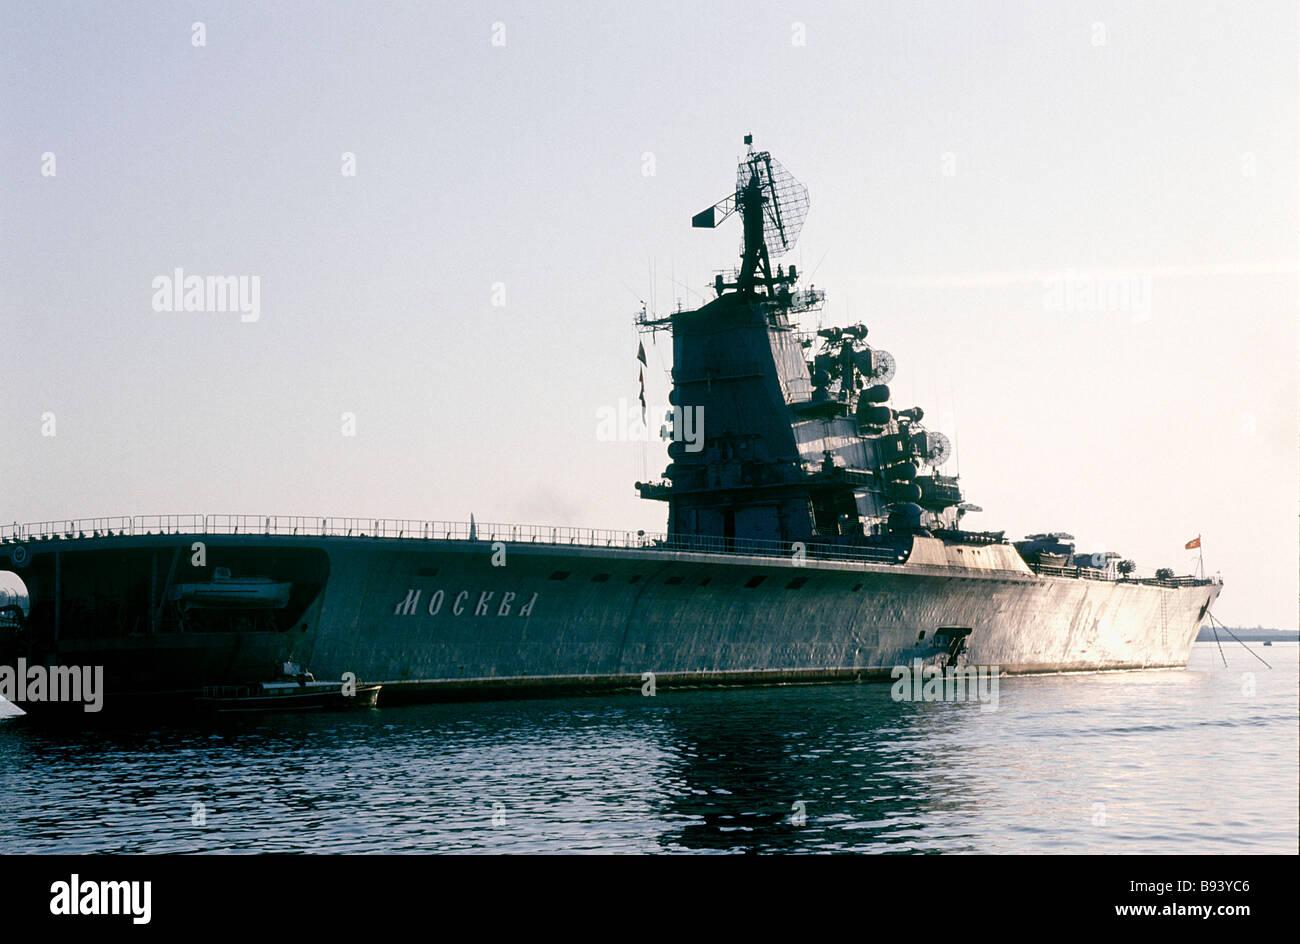 El Moskva GM HEAVY CRUISER el buque insignia de la flota del Mar Negro está de vuelta a Sebastopol base central Foto de stock